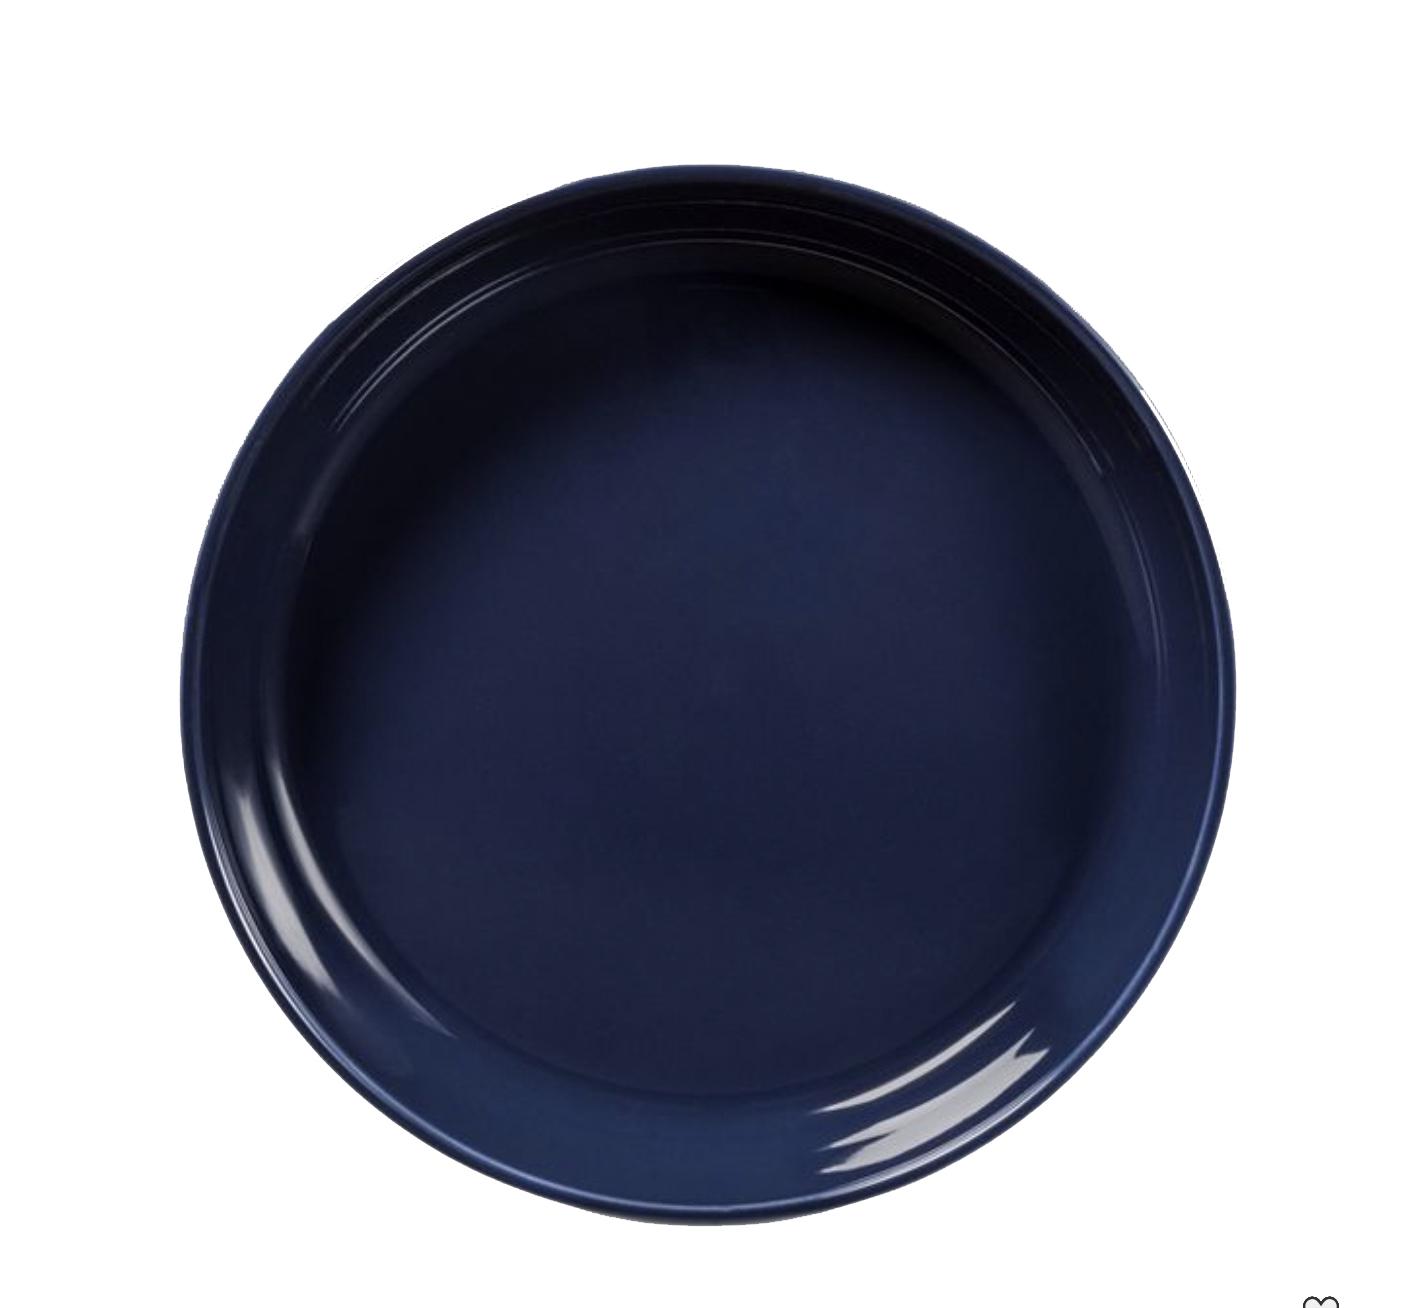 targetbowl